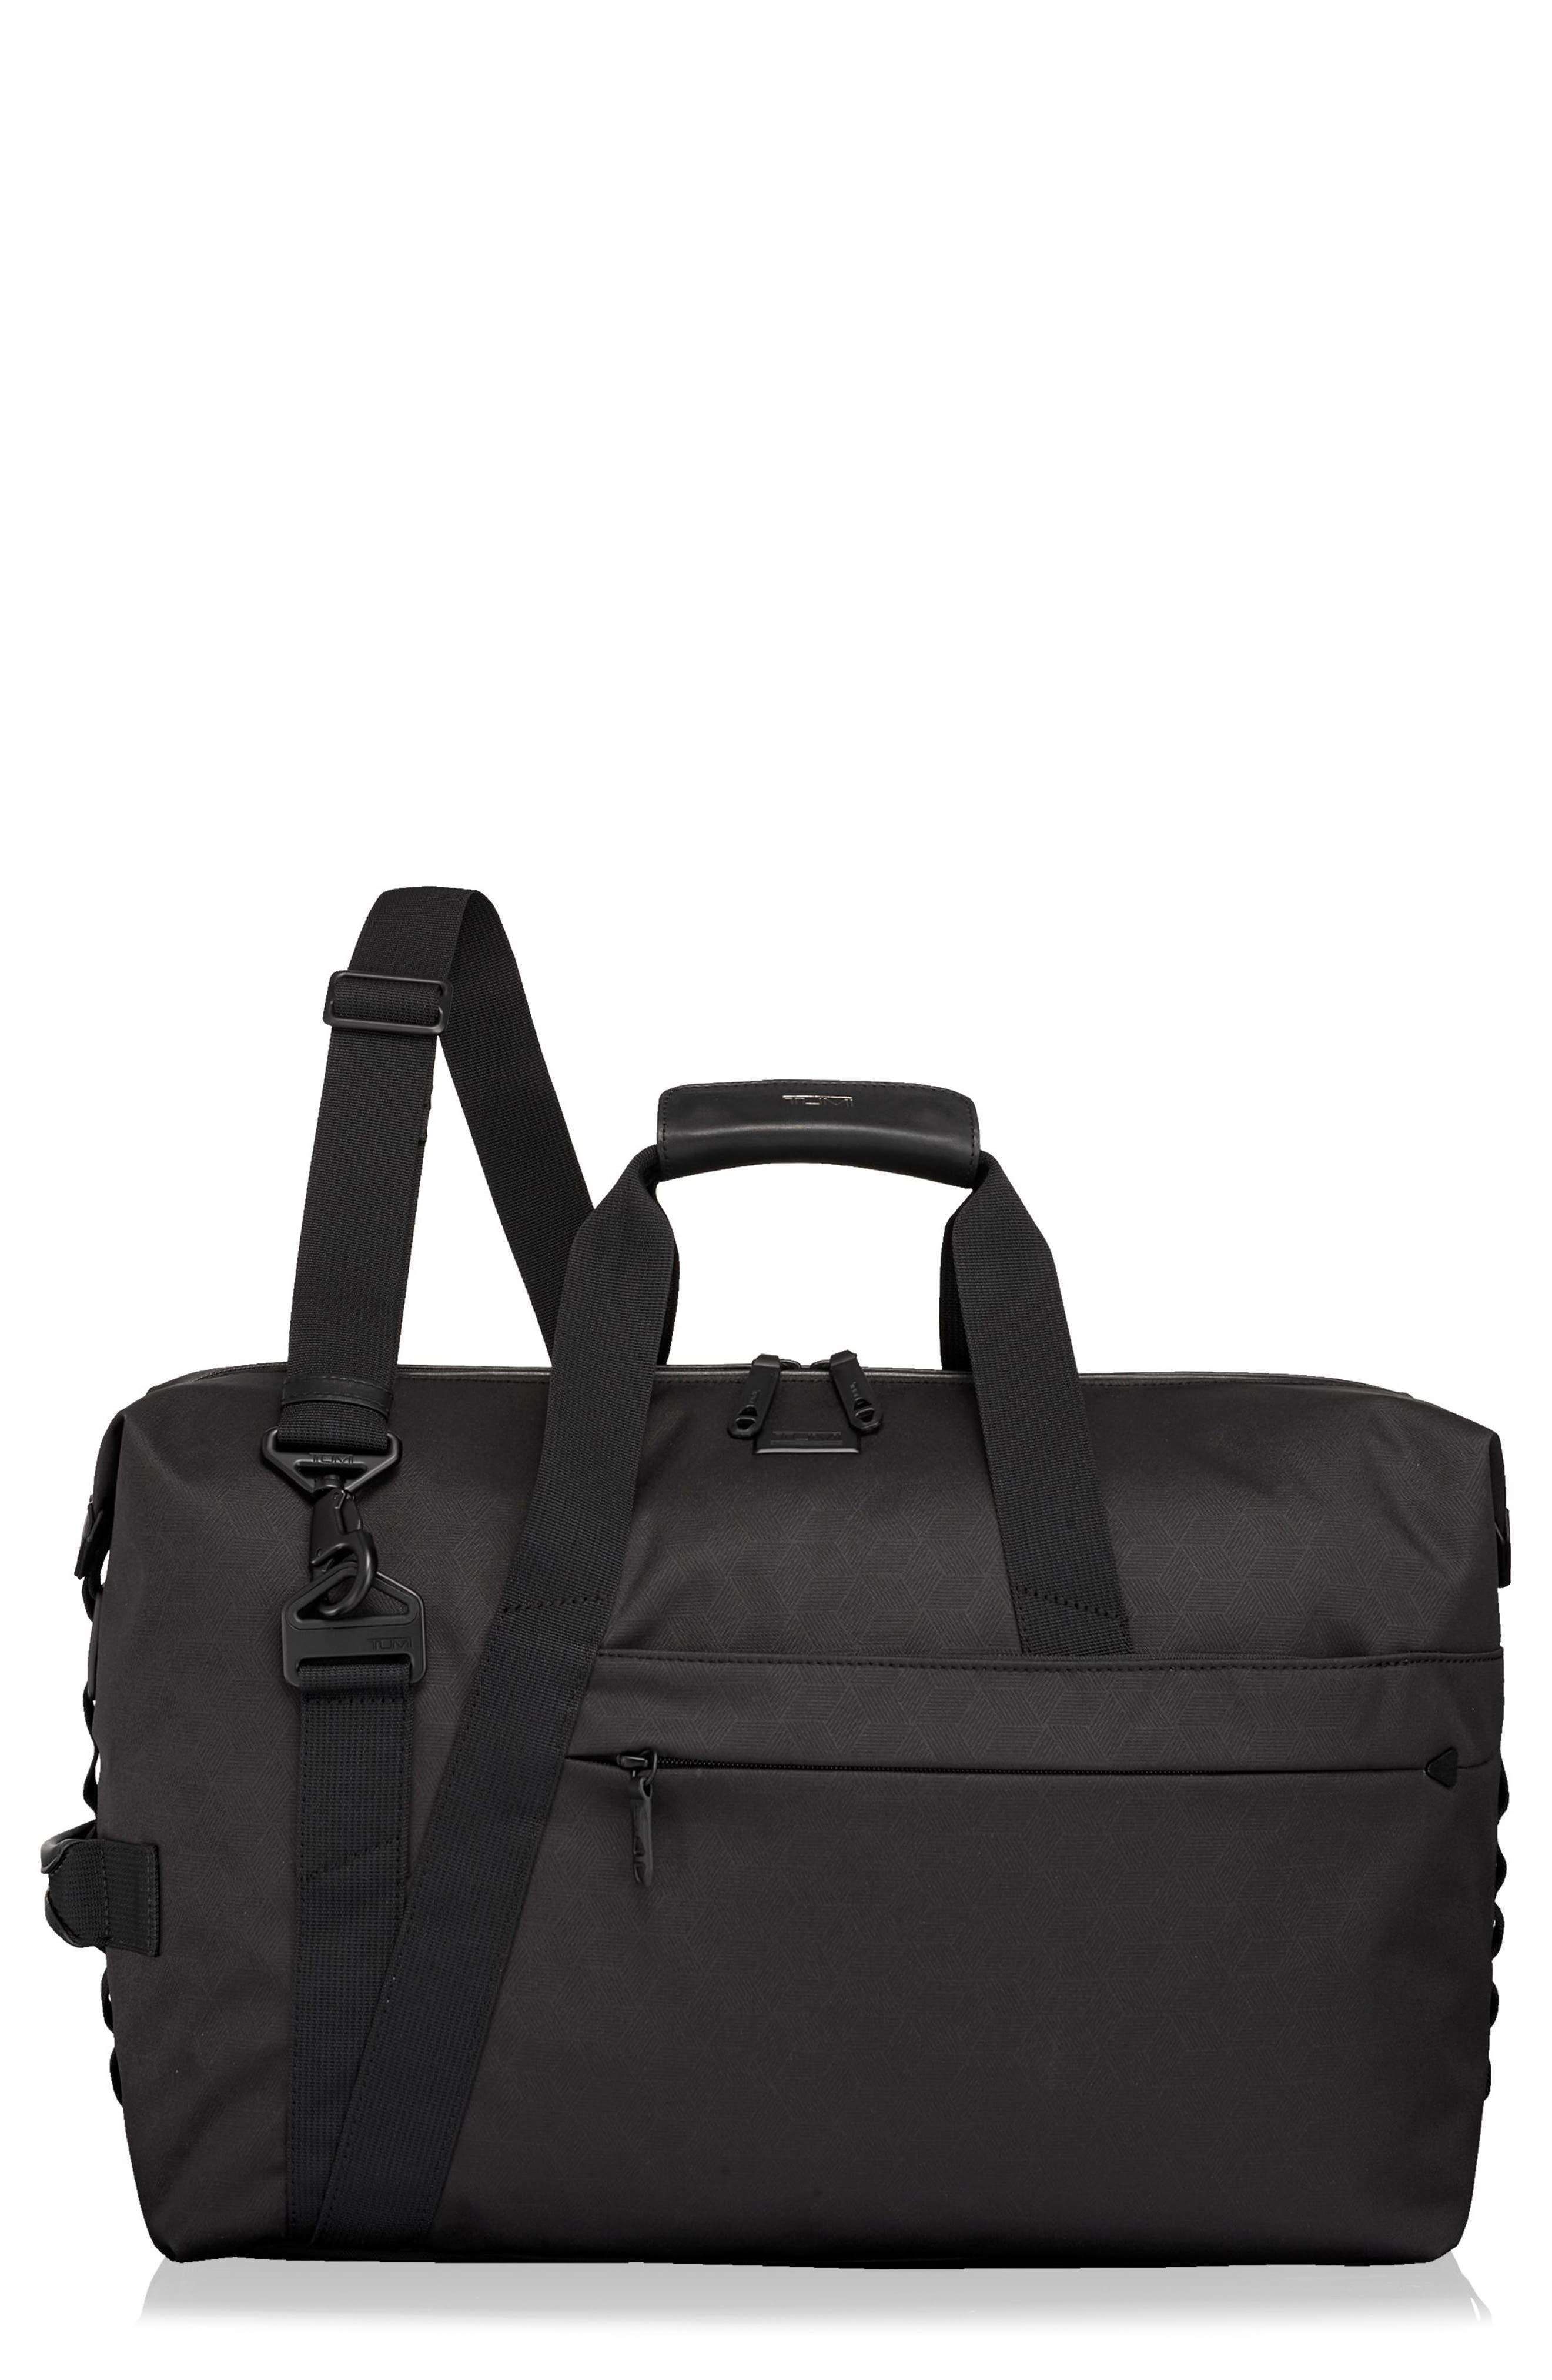 Sonoma Duffel Bag,                             Main thumbnail 1, color,                             Black